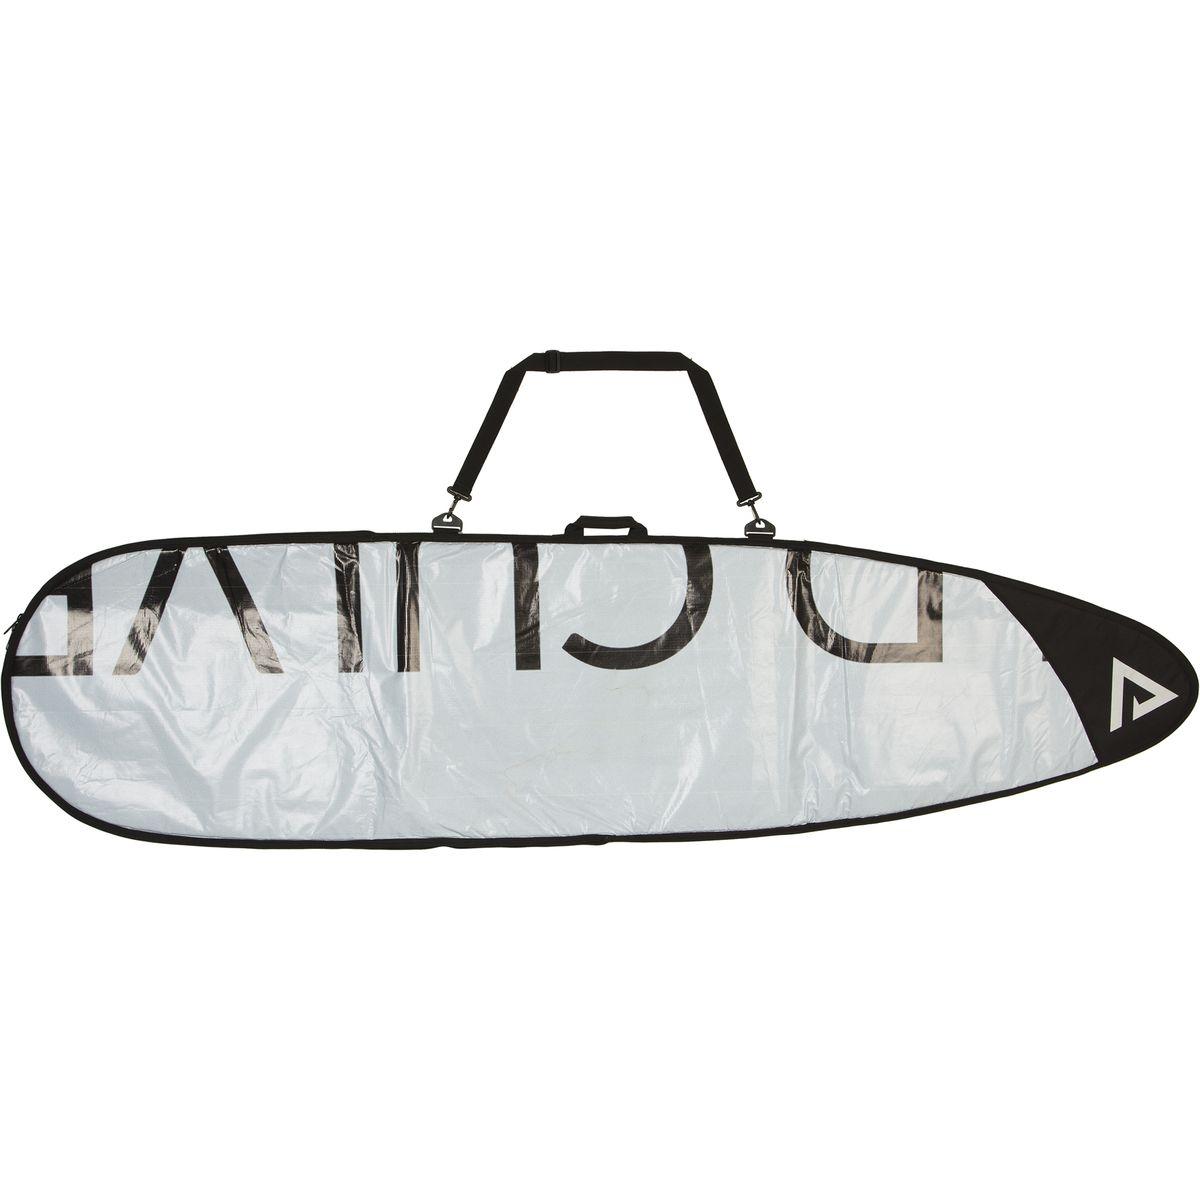 Rareform Daylight Thruster Surfboard Bag Cool, 7ft